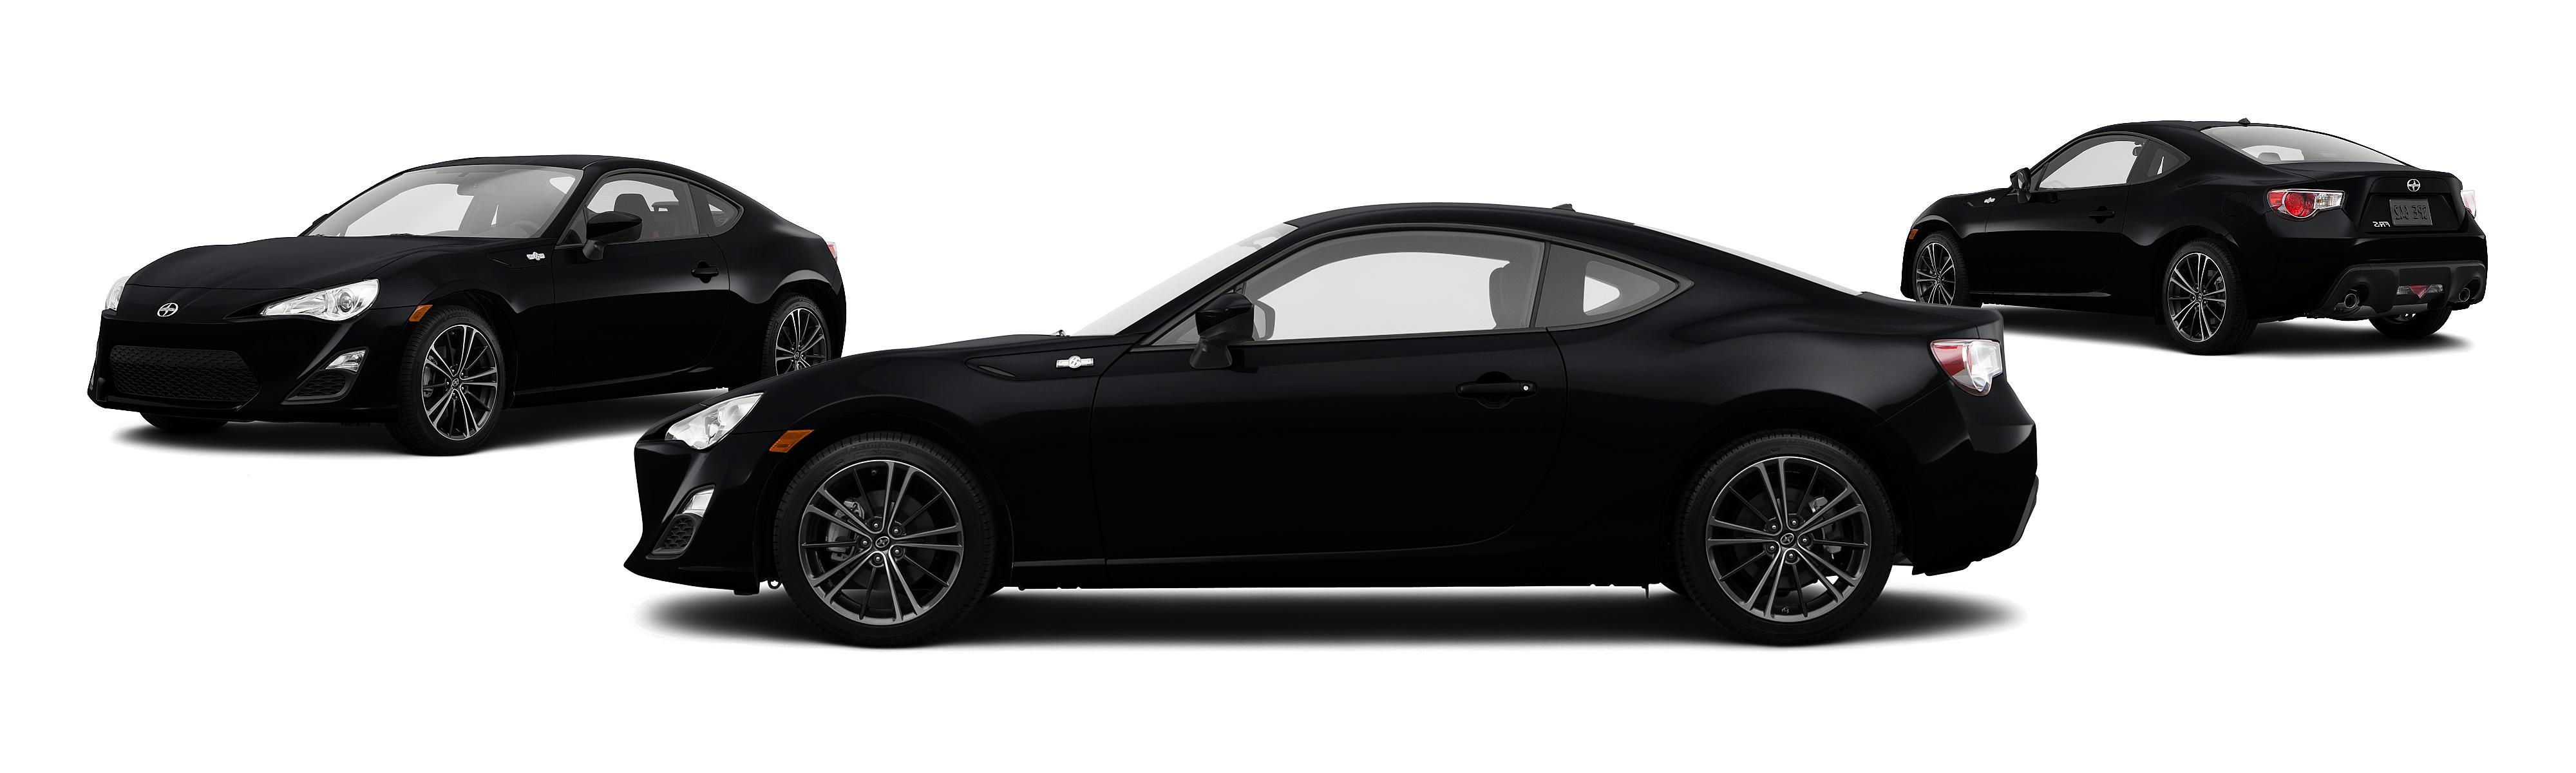 2014 Scion FR S Monogram 2dr Coupe 6M Research GrooveCar